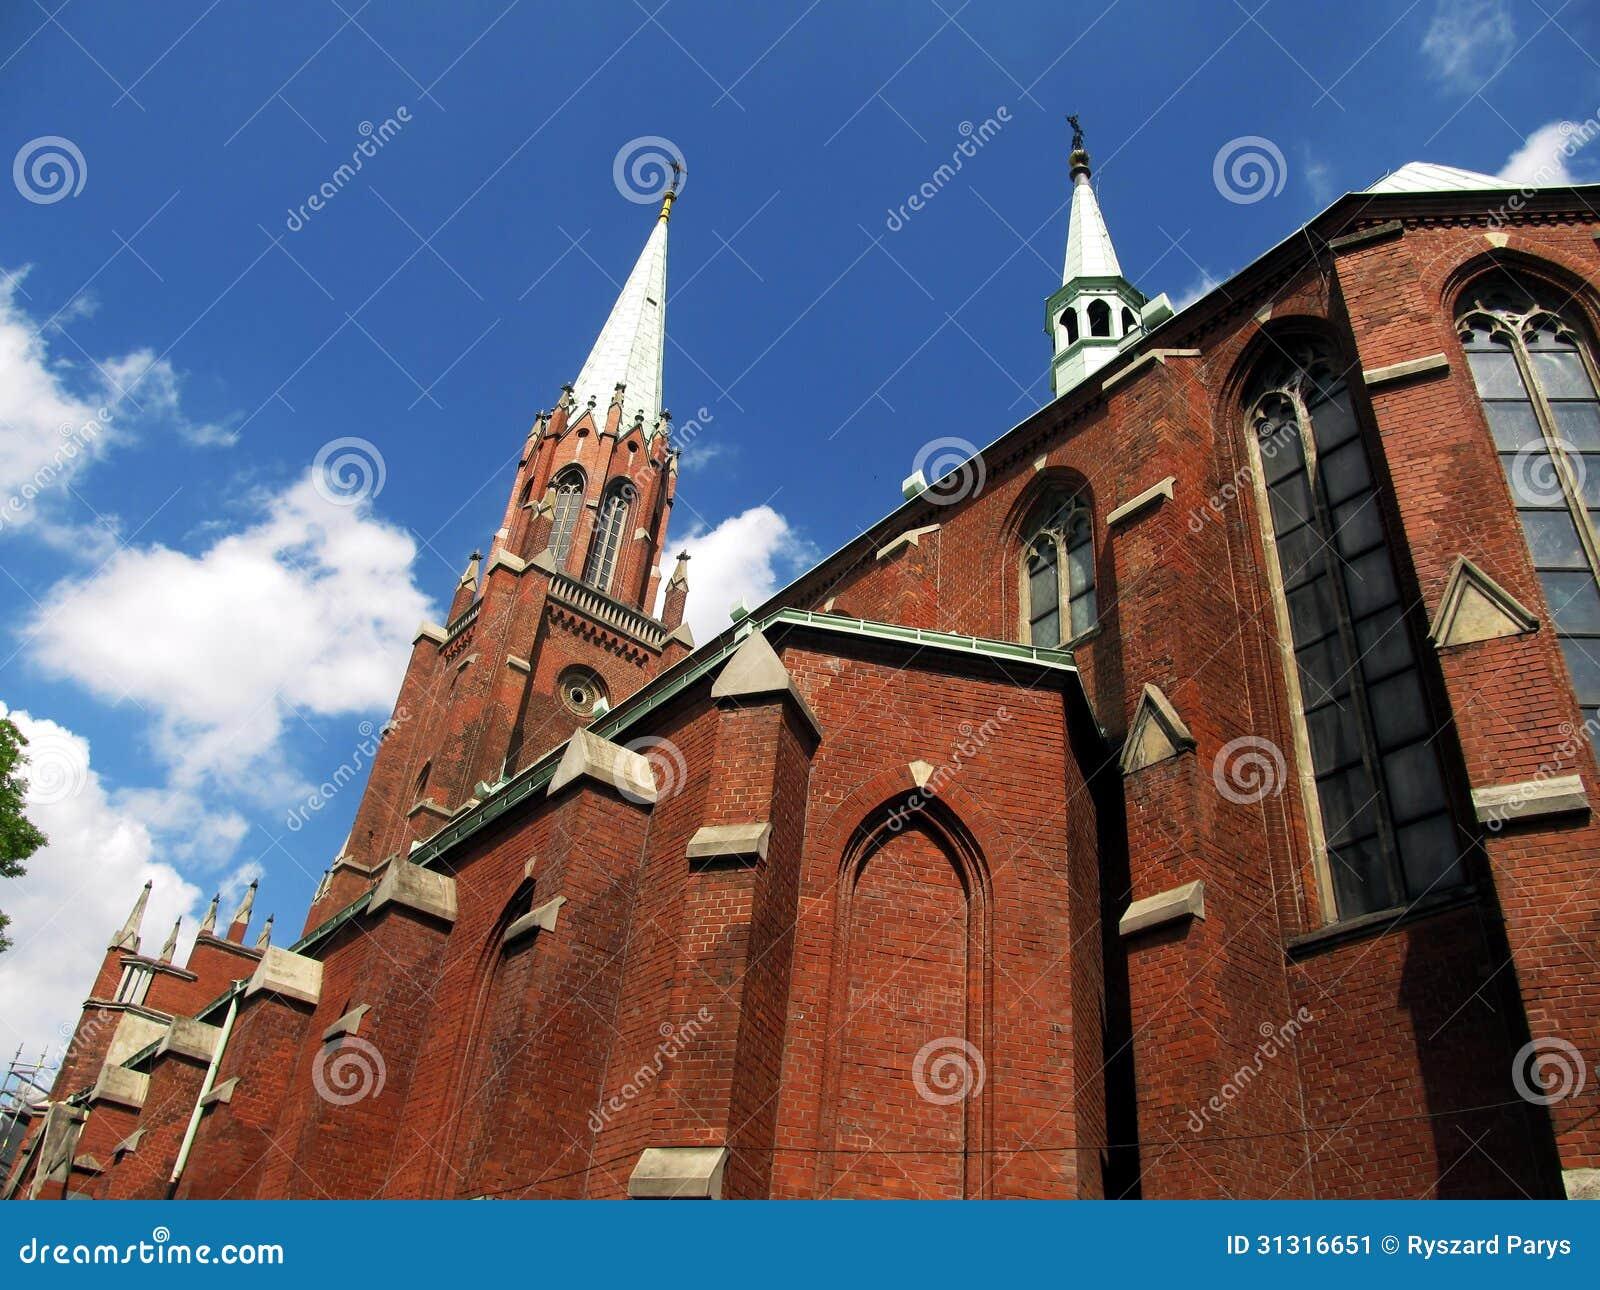 Piekary Slaskie Poland  city images : ... sanctuary and pilgrimage center in Silesia Piekary Slaskie, Poland